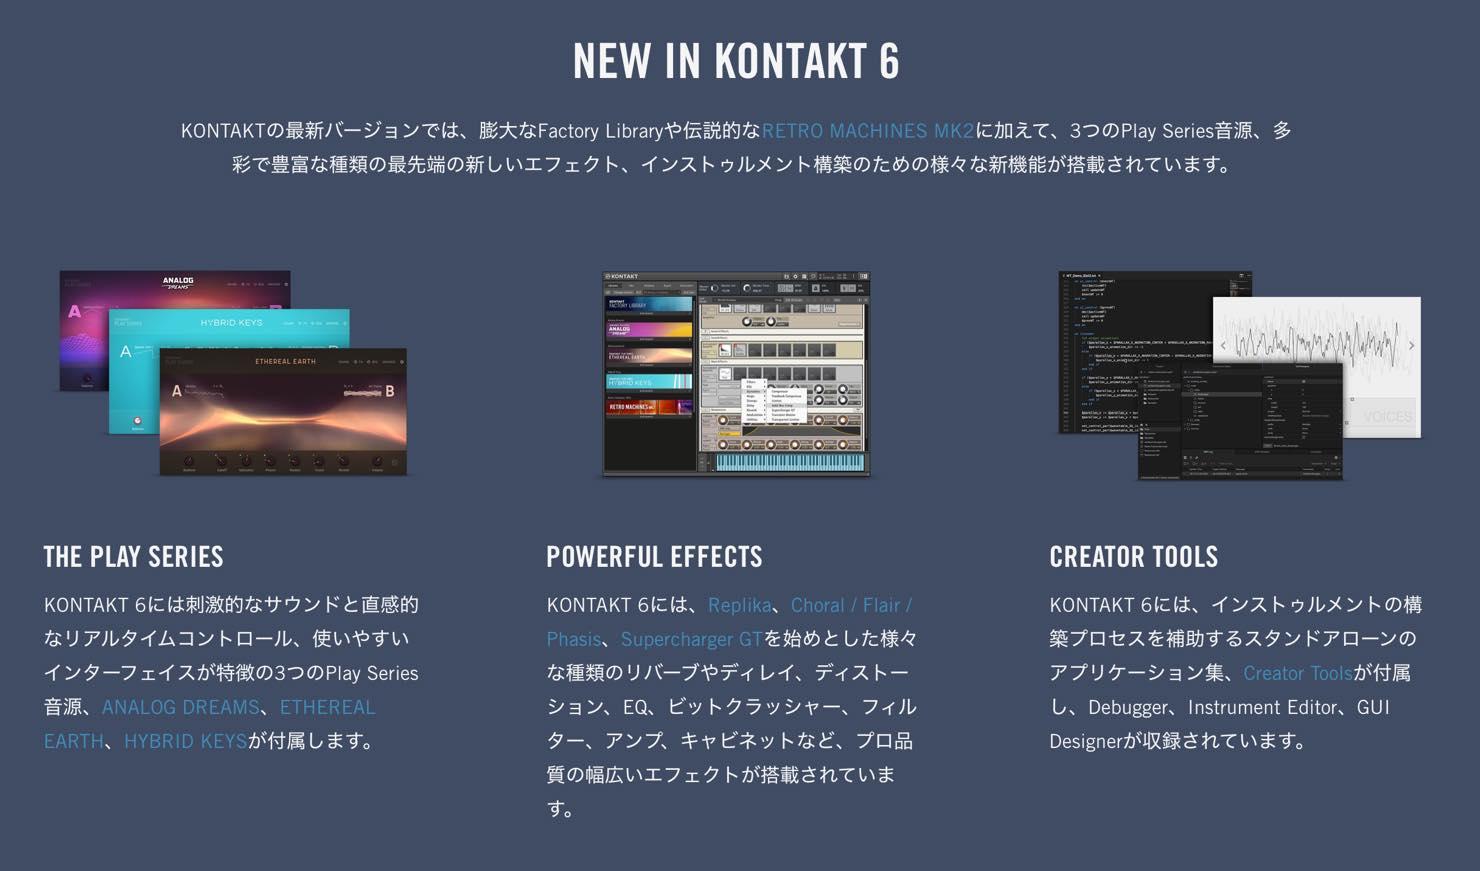 new in kontakt 6